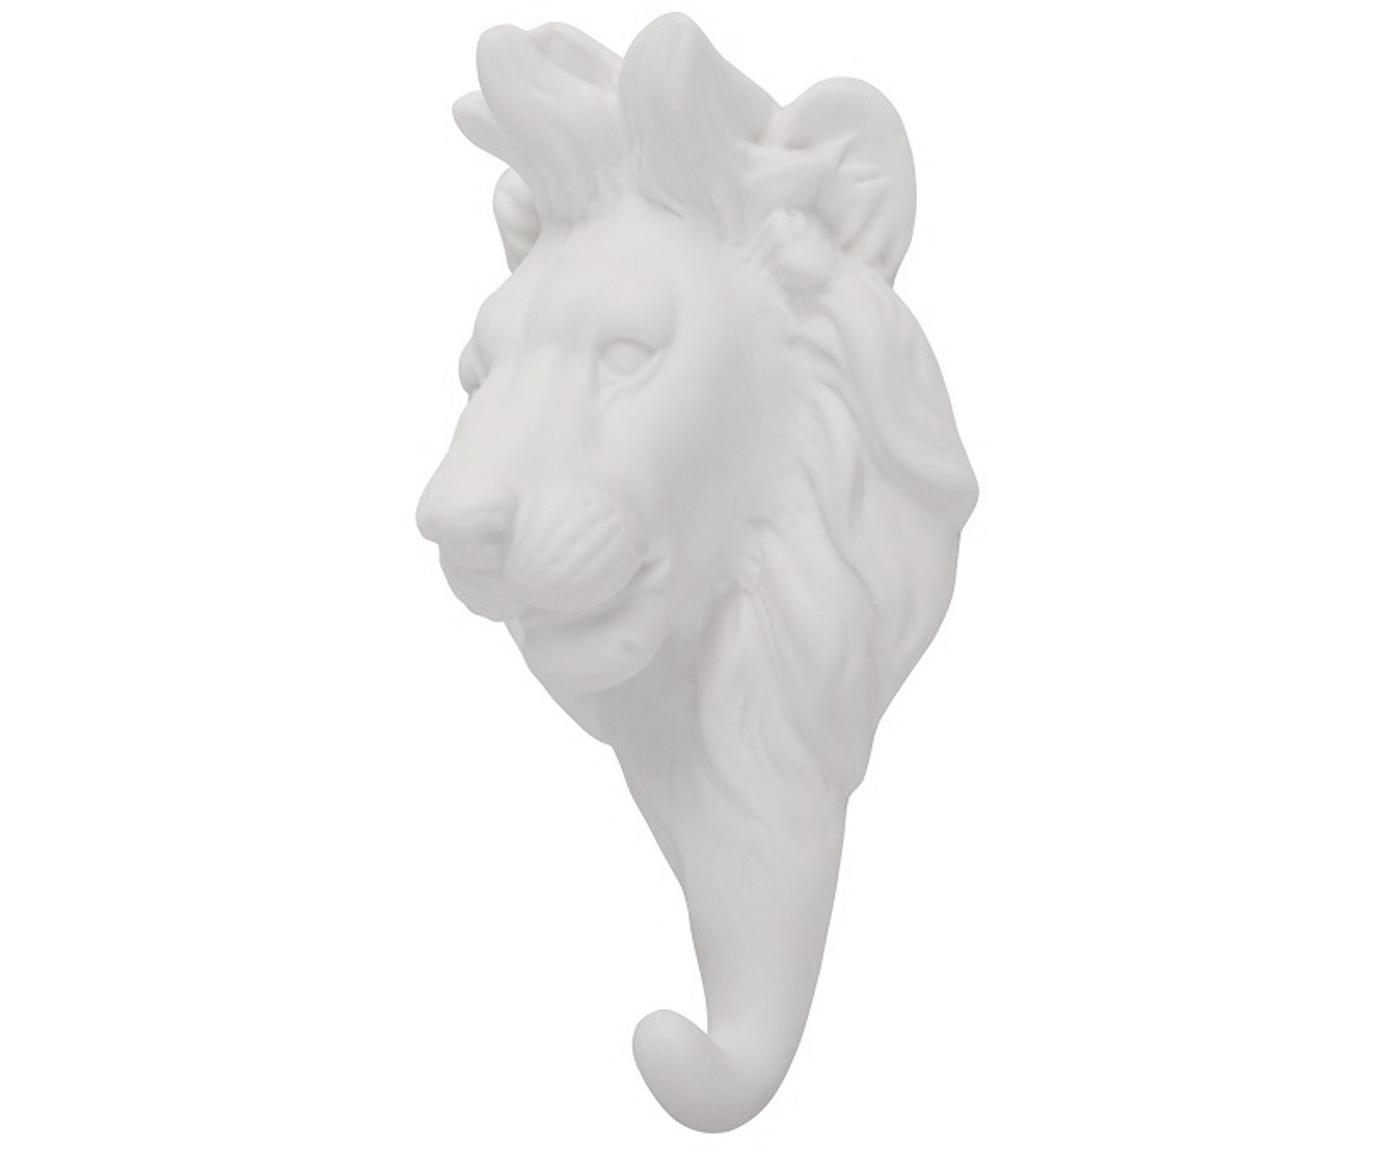 Gancio da parete in porcellana Lion, Porcellana, Bianco, Alt. 15 cm